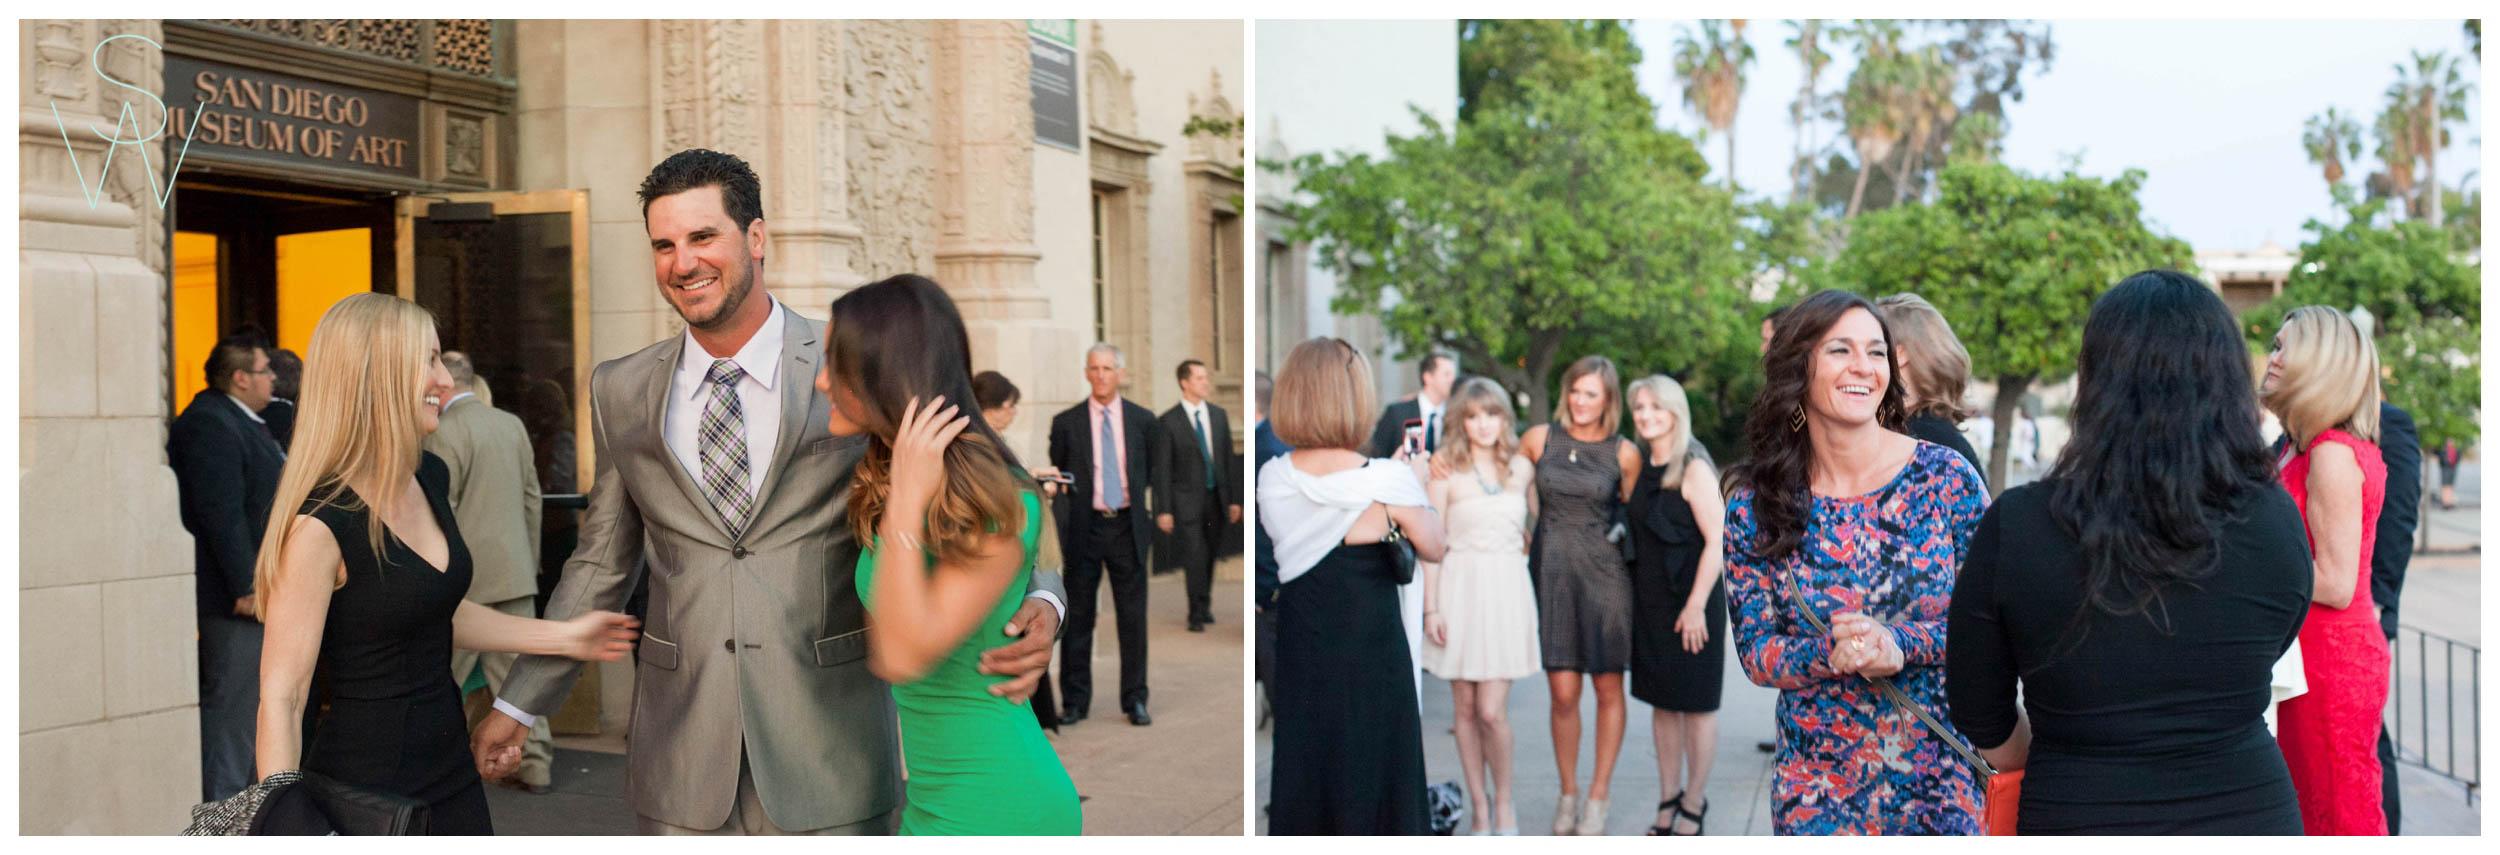 Shewanders.sdma_.wedding.photography-1044.jpg.wedding.photography-1044.jpg